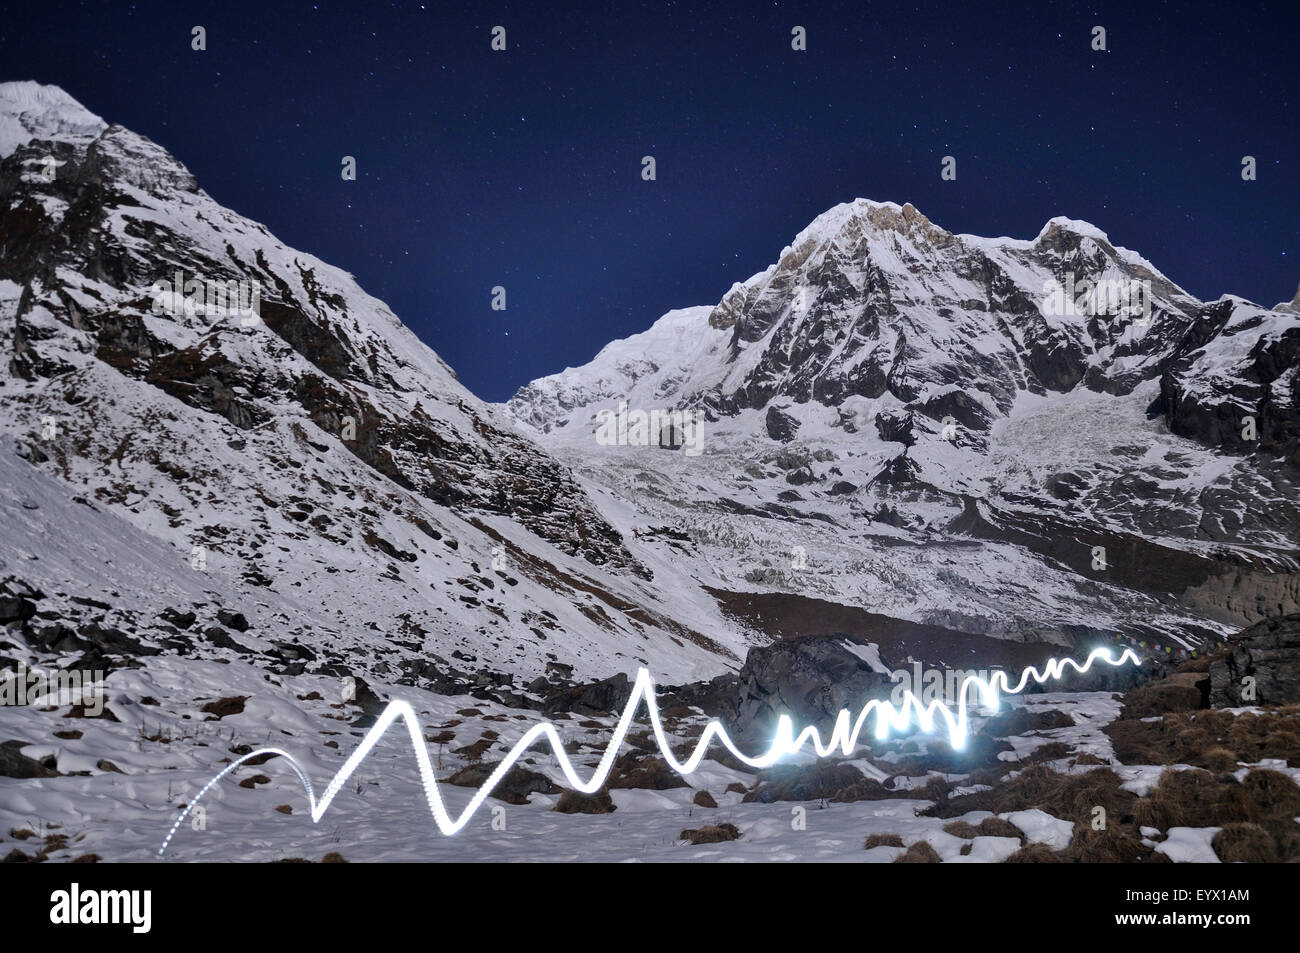 Light Painting at Annapurna Base Camp - Stock Image